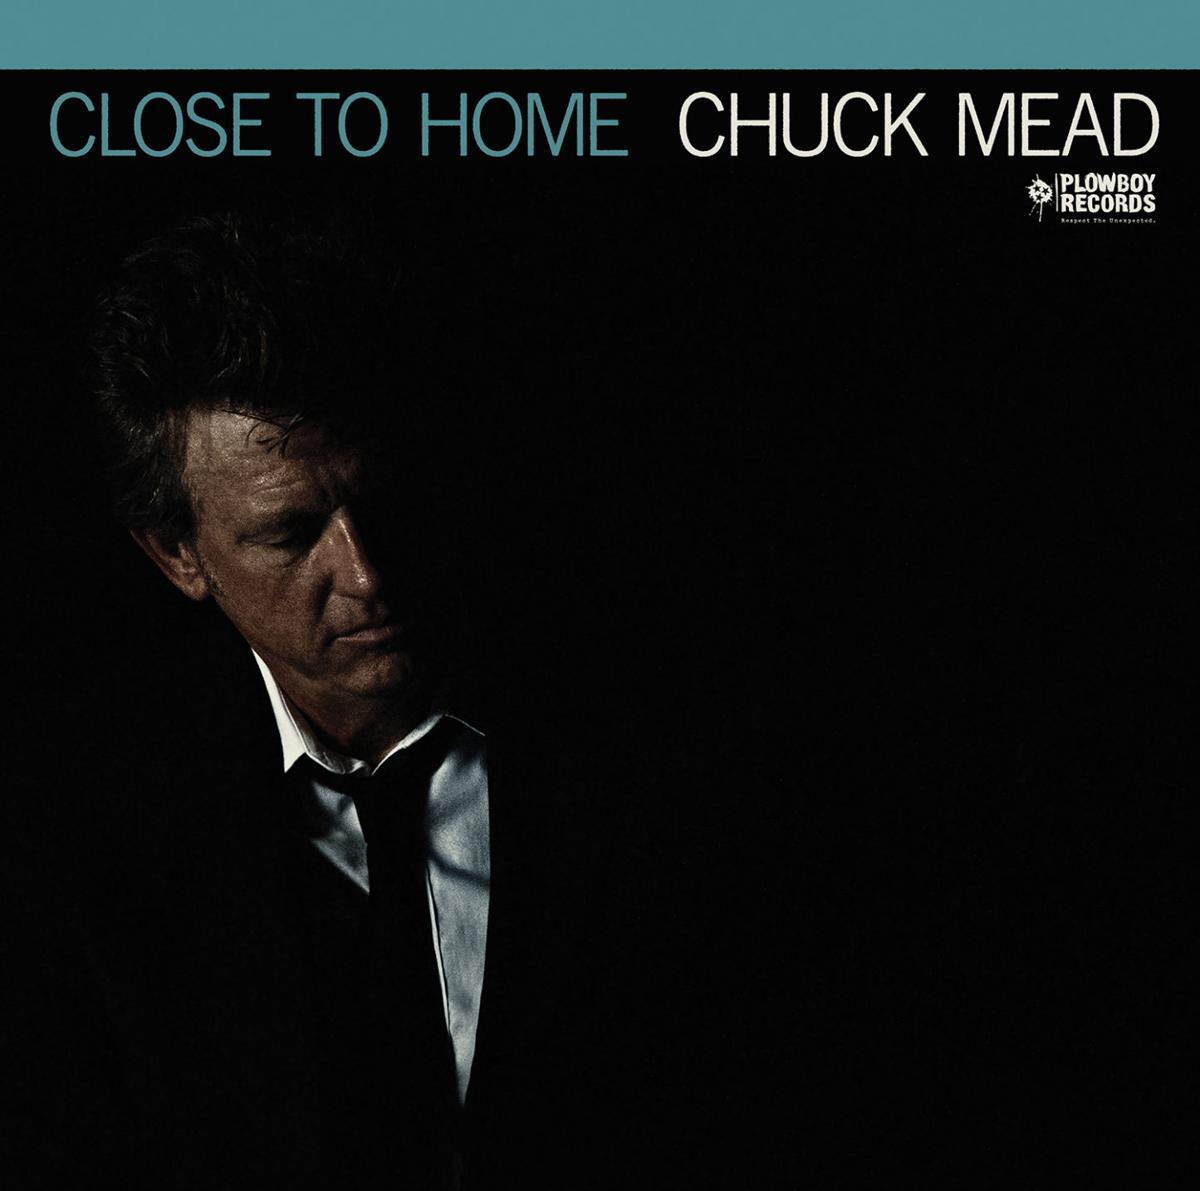 chuck mead_close to  home_ALBUM-COVER_C